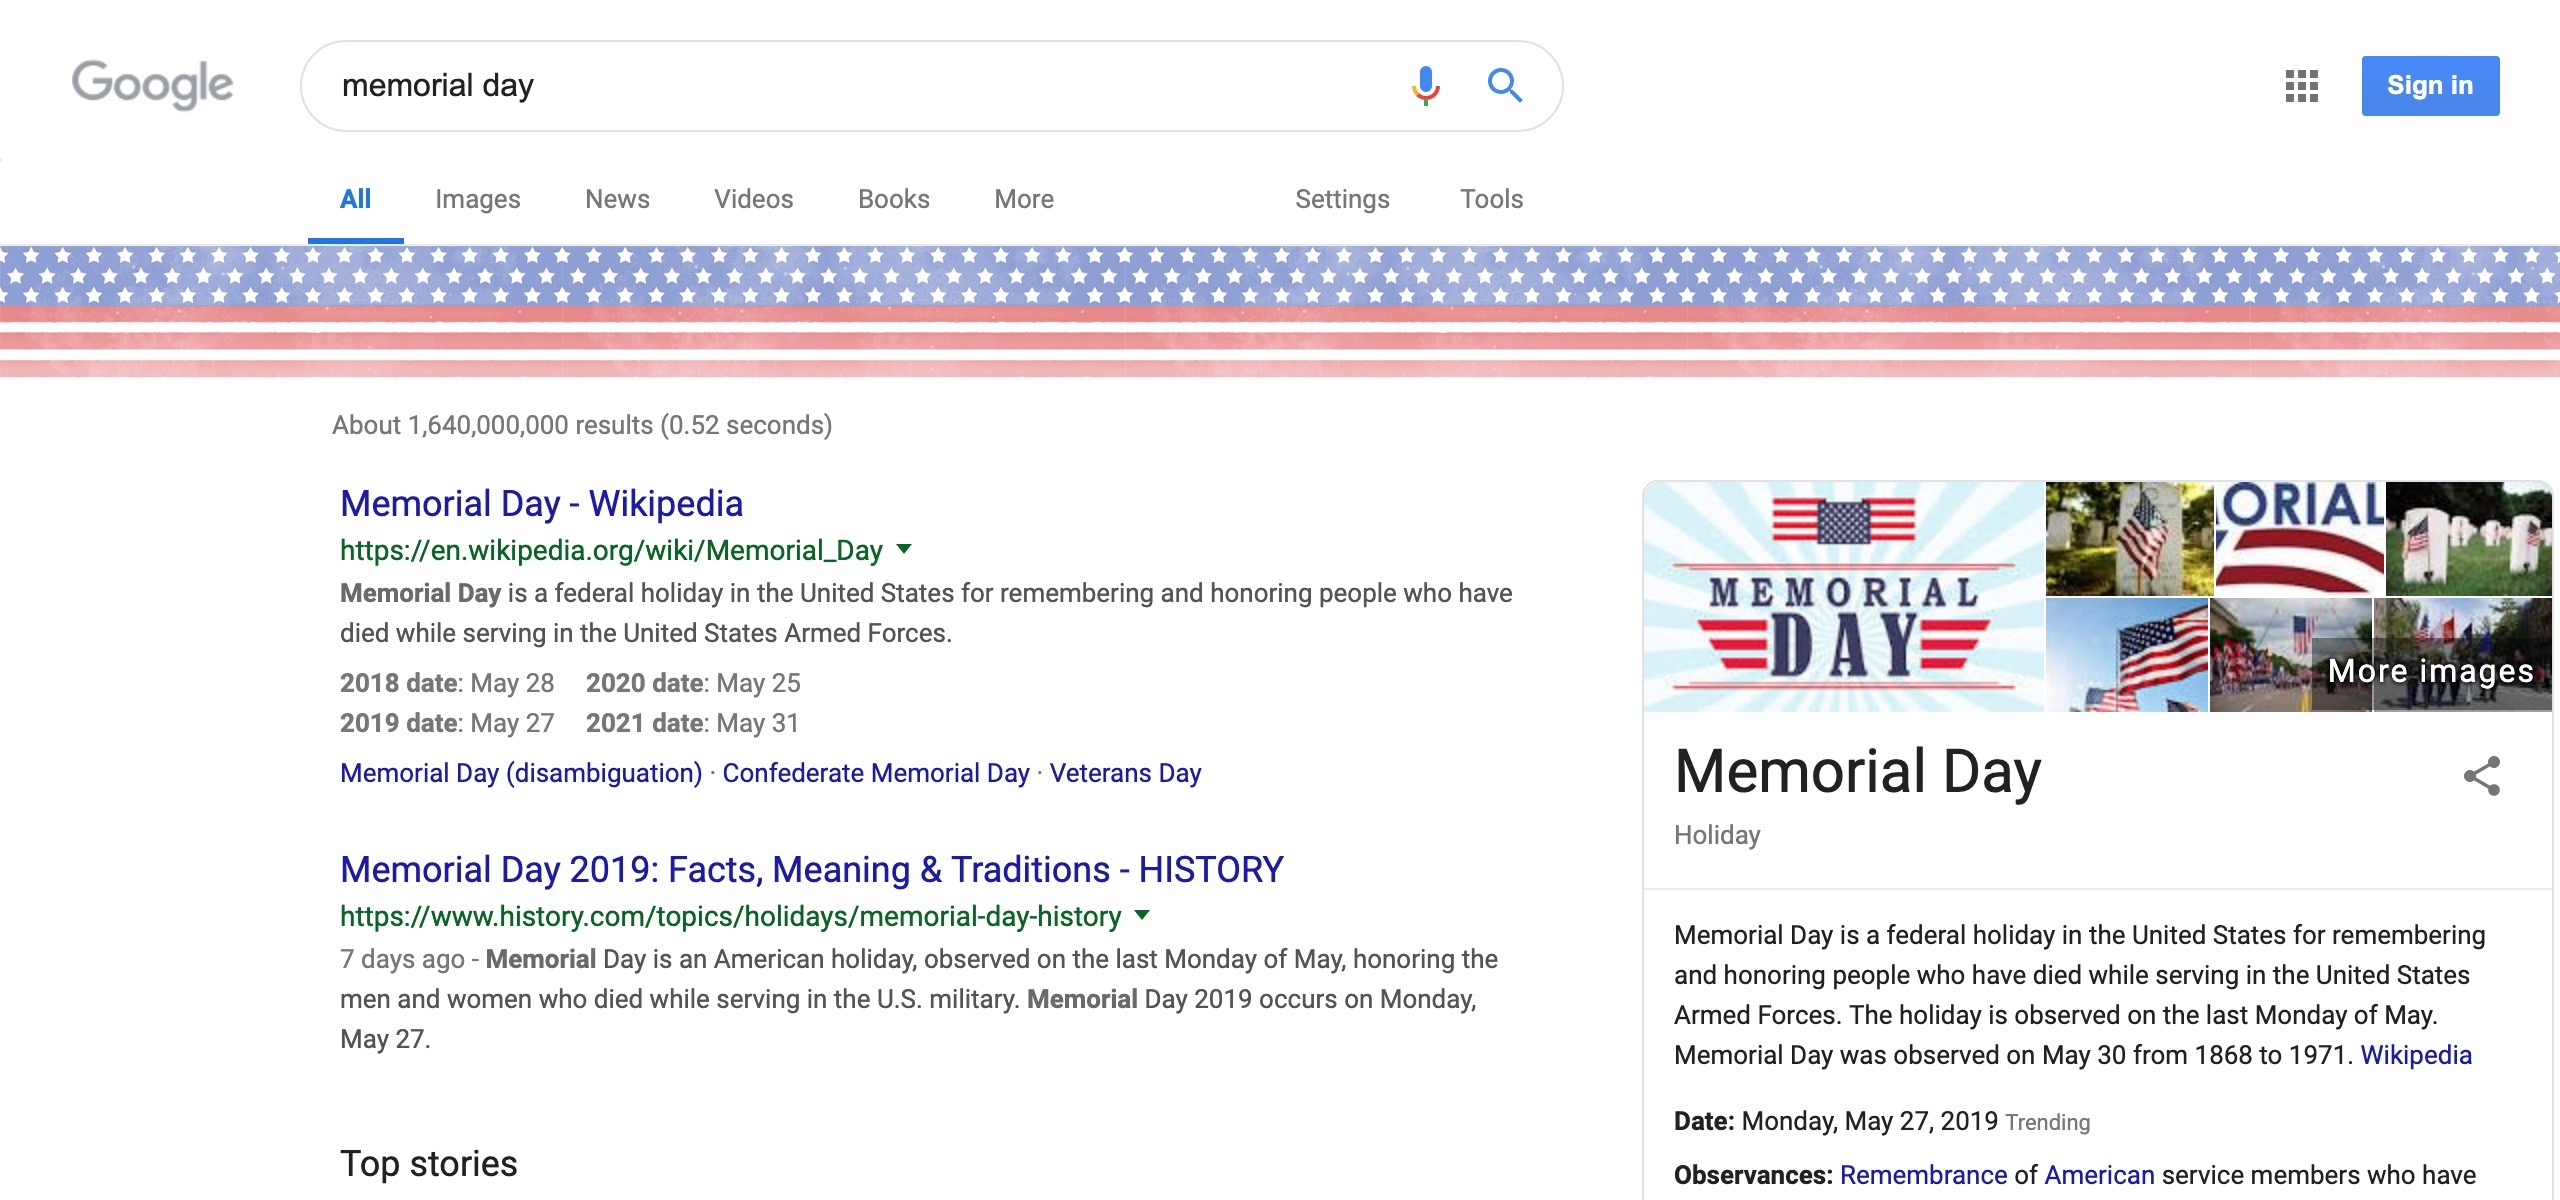 Google Doodle Memorial Day